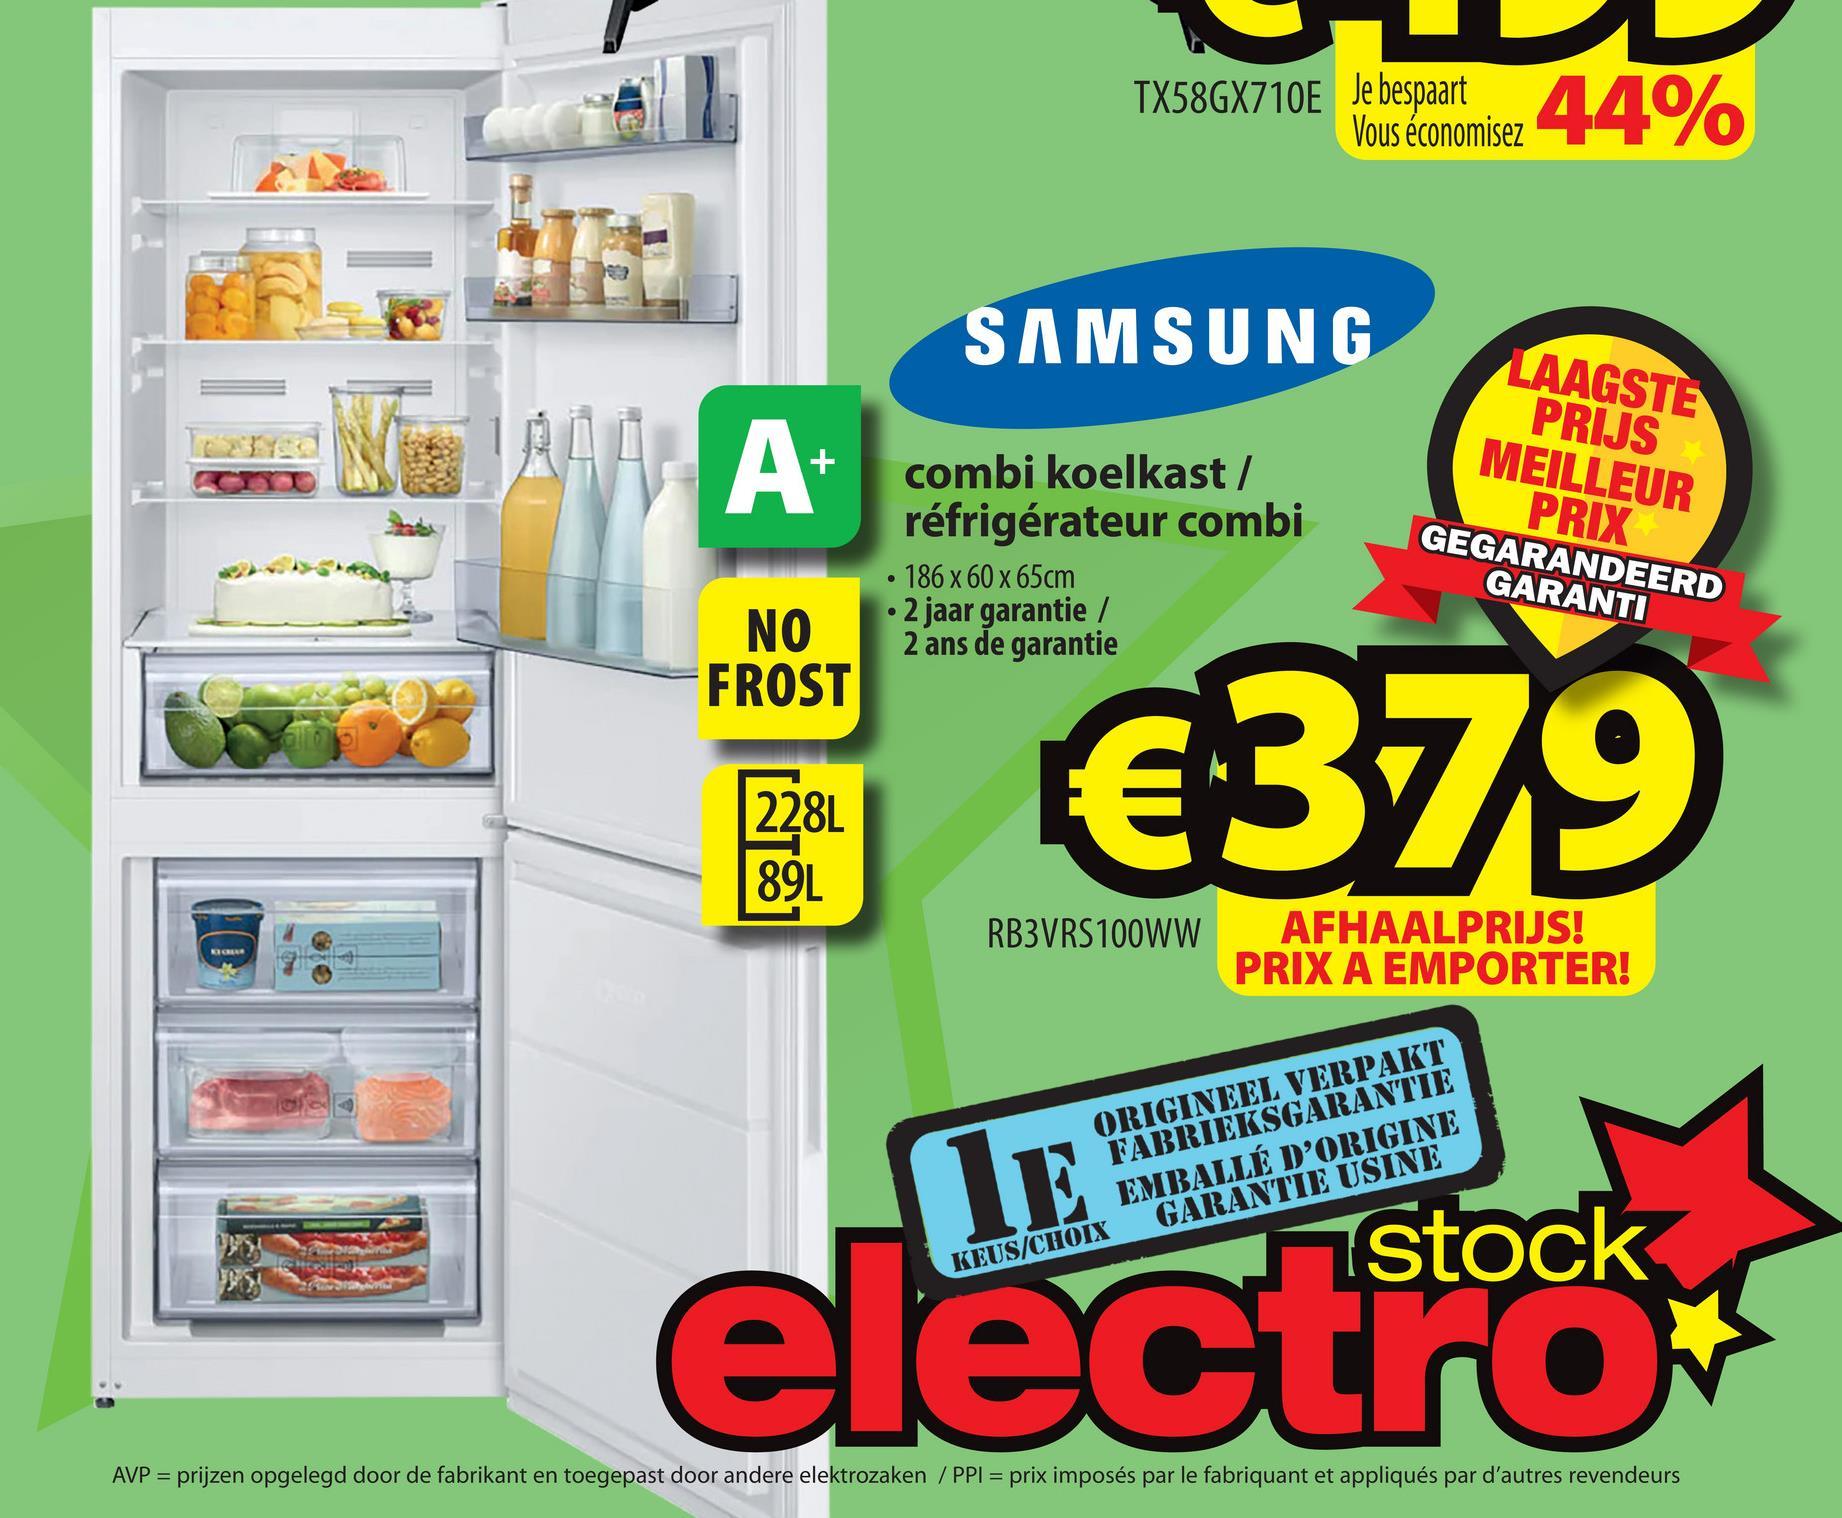 TX58GX710E Je bespaart Vous économisez SAMSUNG combi koelkast / réfrigérateur combi 186 x 60 x 65cm • 2 jaar garantie / 2 ans de garantie LAAGSTE PRIJS MEILLEUR PRIX GEGARANDEERD GARANTI e NO FROST €379 228L 89L RB3VRS100WW AFHAALPRIJS! PRIX A EMPORTER! ORIGINEEL VERPAKT FABRIEKSGARANTIE EMBALLÉ D'ORIGINE KEUS/CHOIX GARANTIE USINE IE electrock AVP = prijzen opgelegd door de fabrikant en toegepast door andere elektrozaken/PPI = prix imposés par le fabriquant et appliqués par d'autres revendeurs